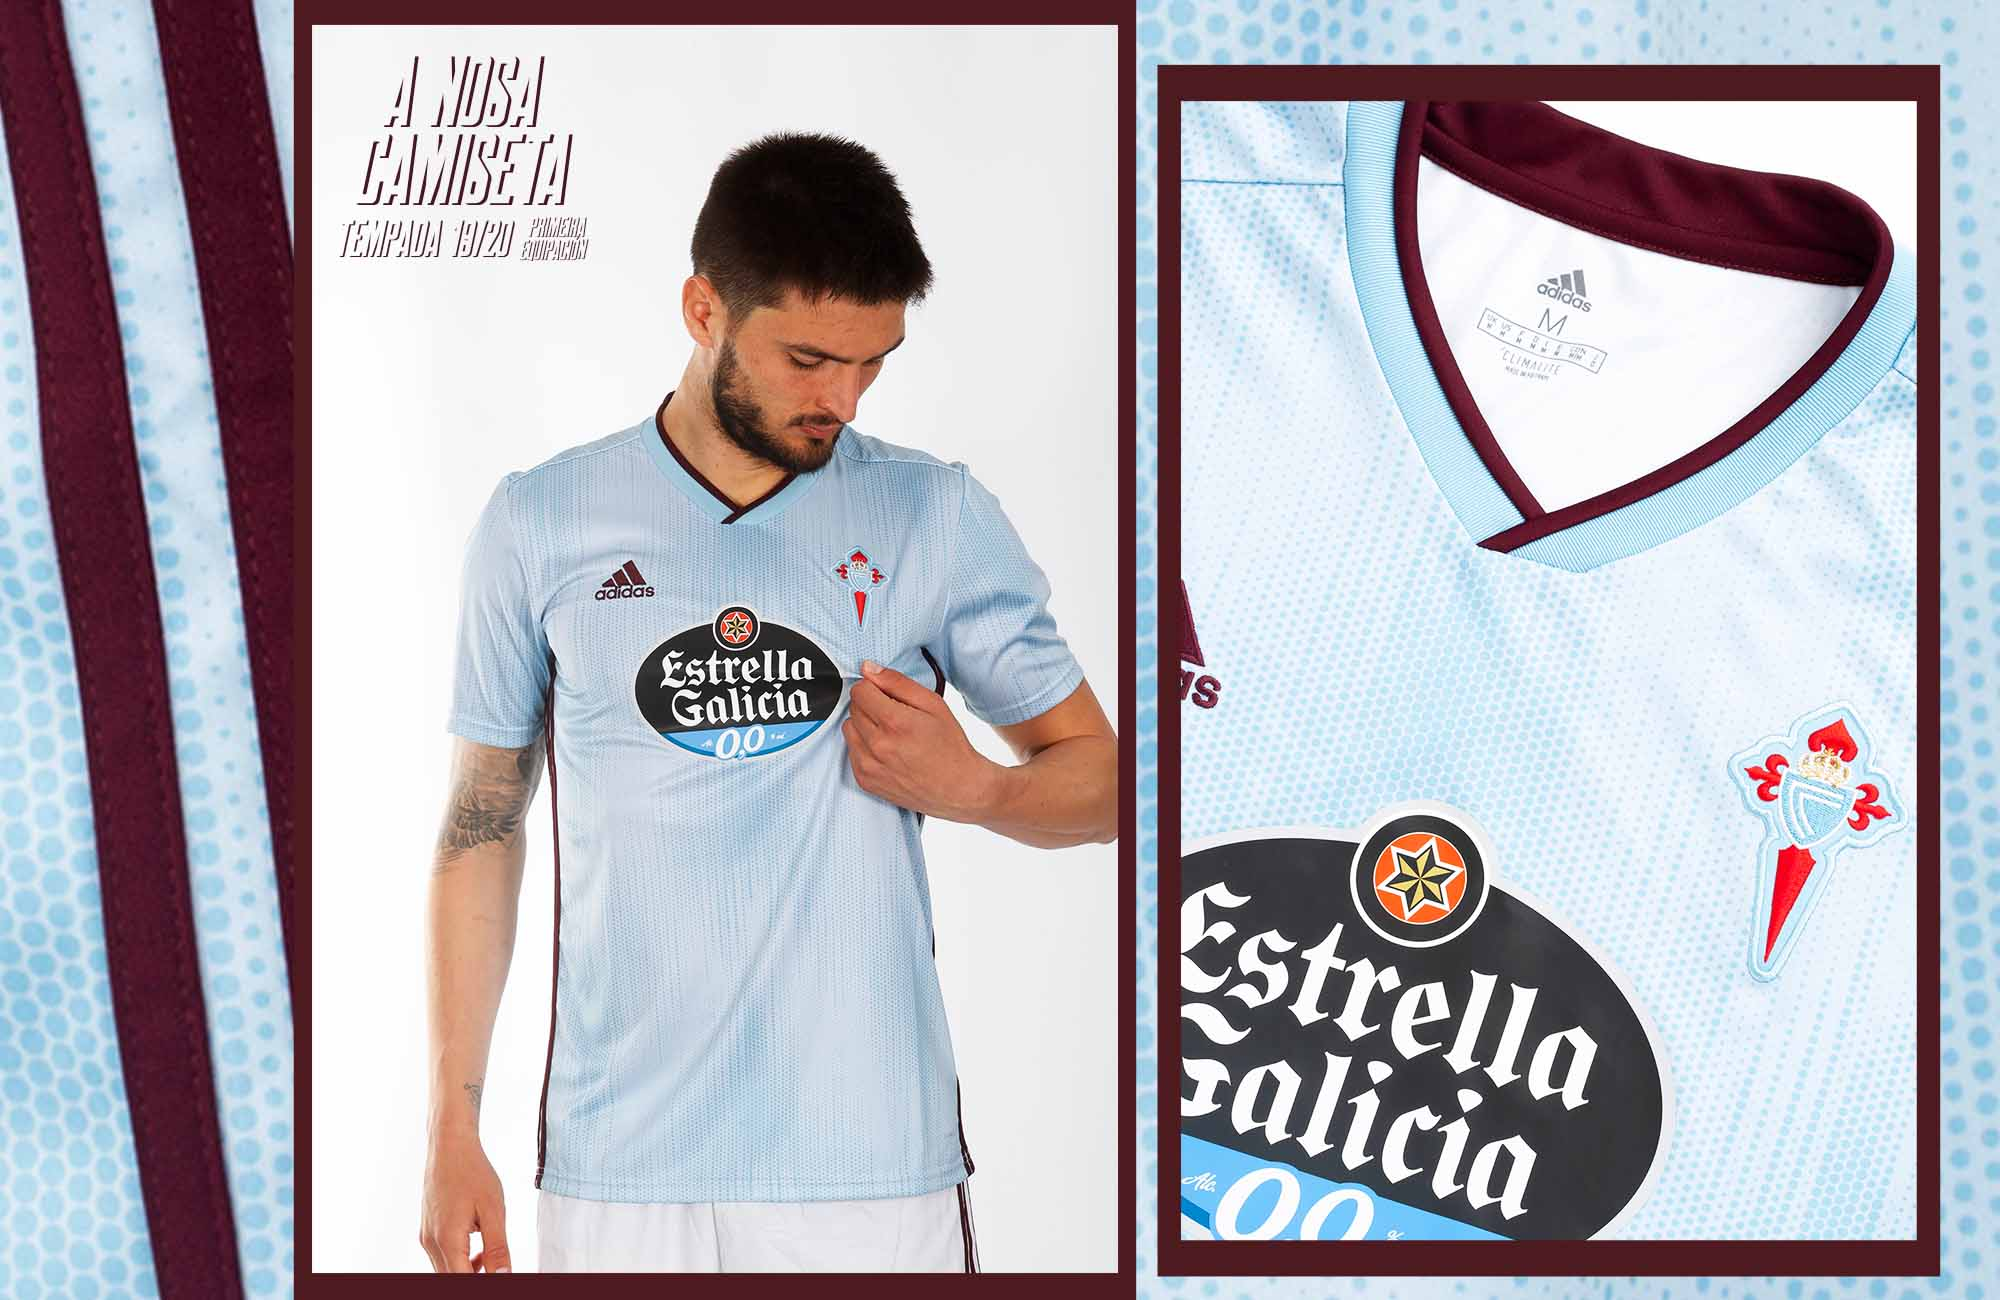 Celta de Vigo 201920 adidas Home Kit FOOTBALL FASHION.ORG